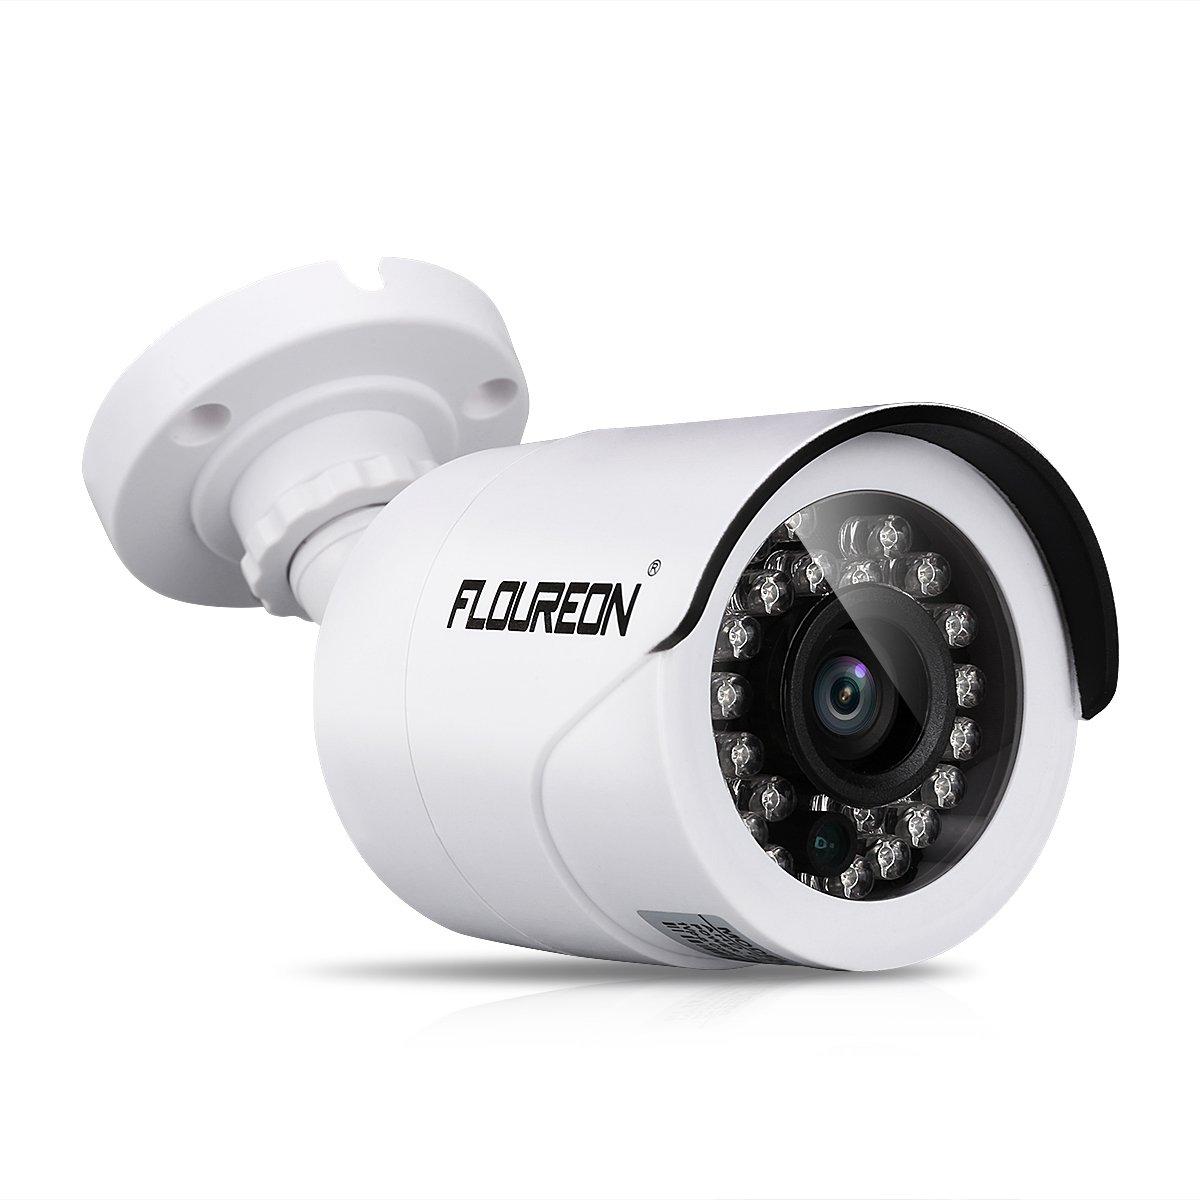 FLOUREON 2000TVL Überwachungskamera